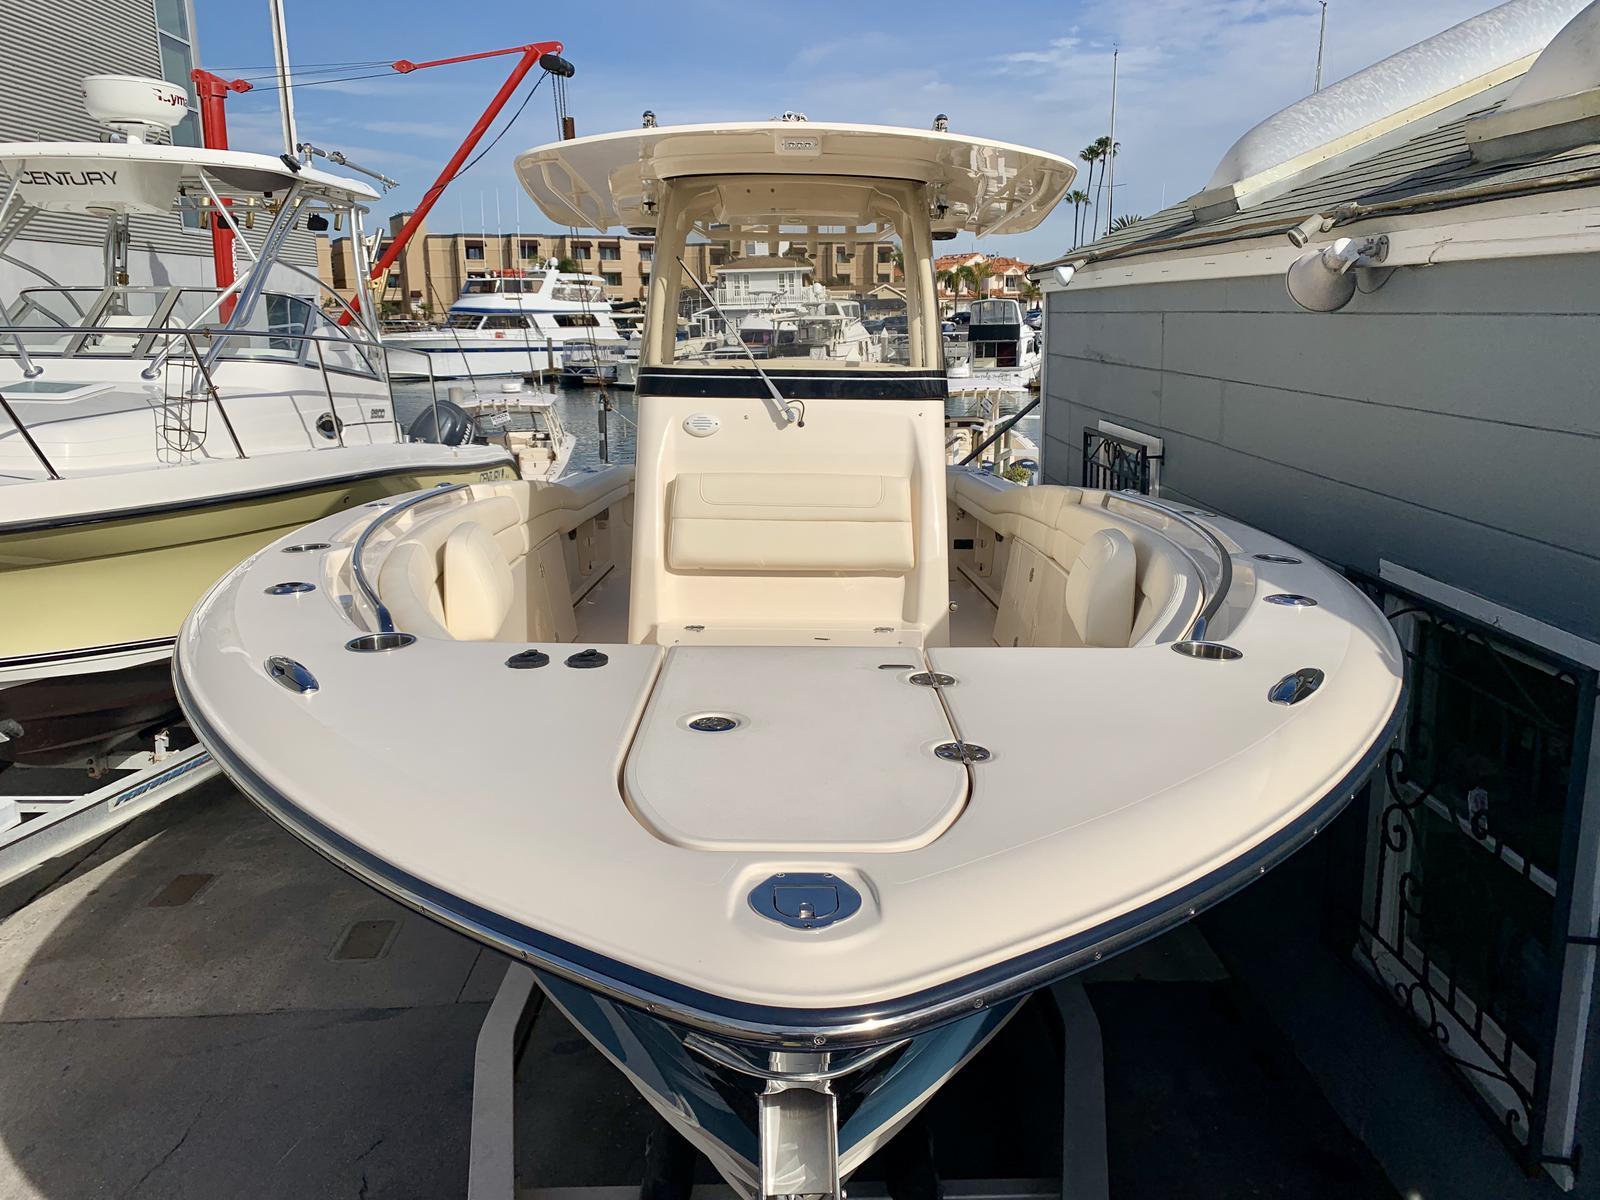 2019 Grady-White Canyon 271 for sale in Newport Beach, CA